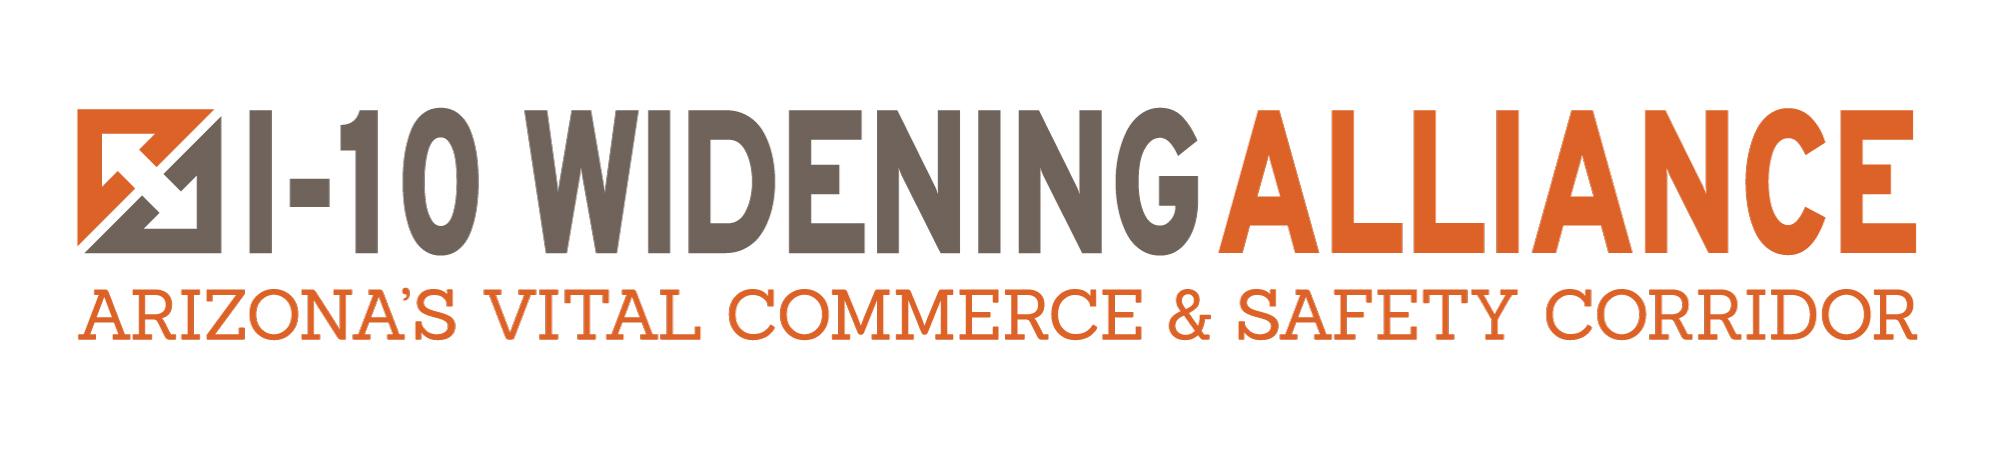 I10-Widening-Alliance-logo-2000.jpg